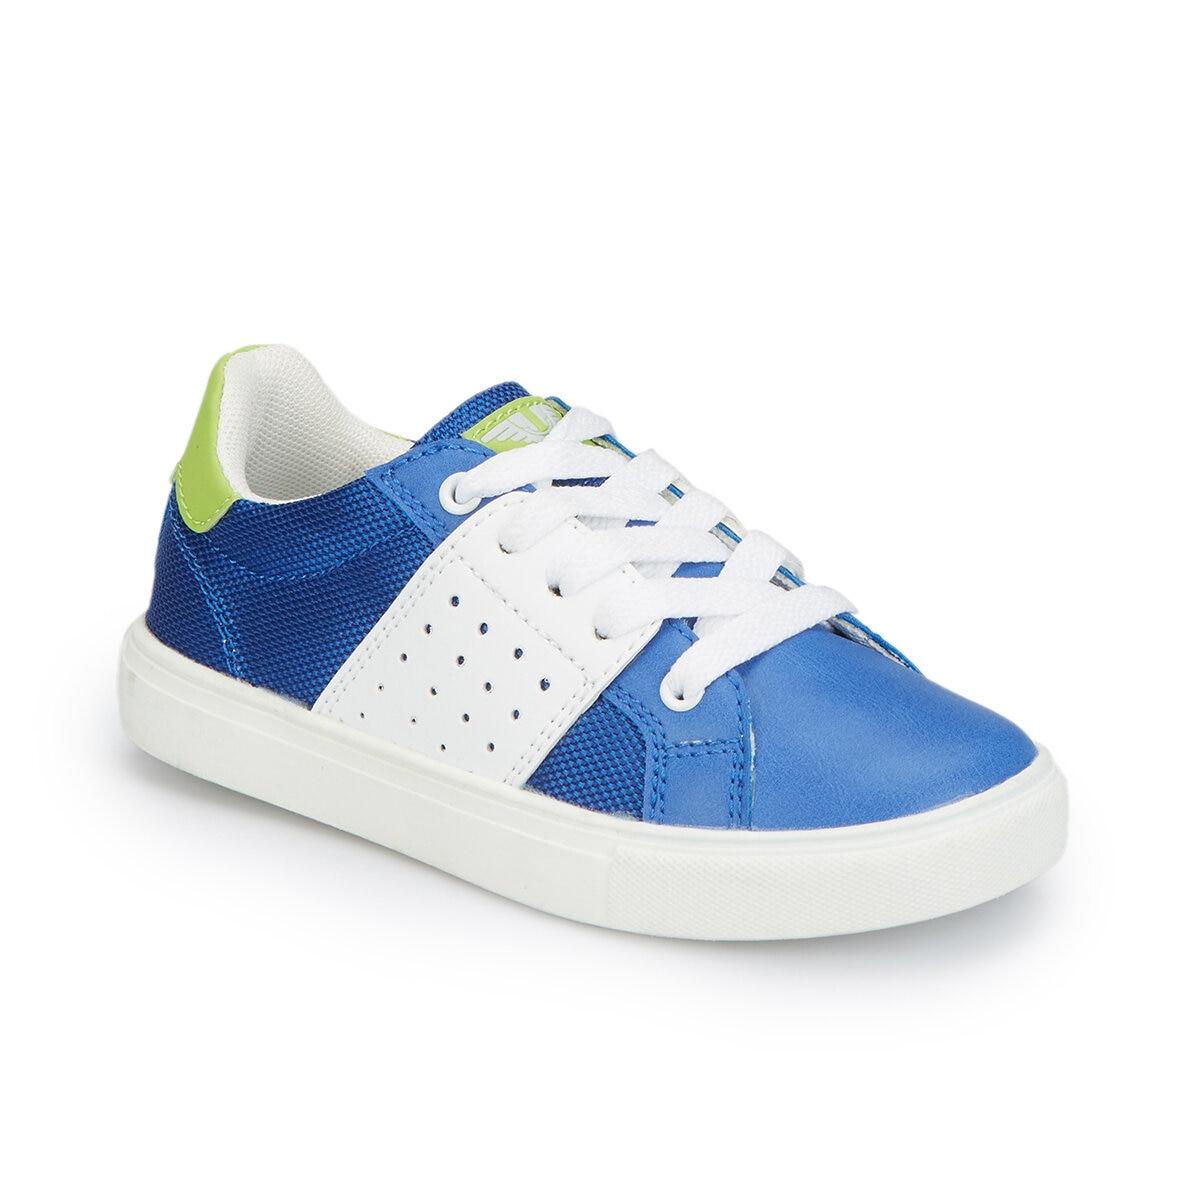 FLO 81.510398.F Navy Blue Male Child Sneaker Shoes Polaris